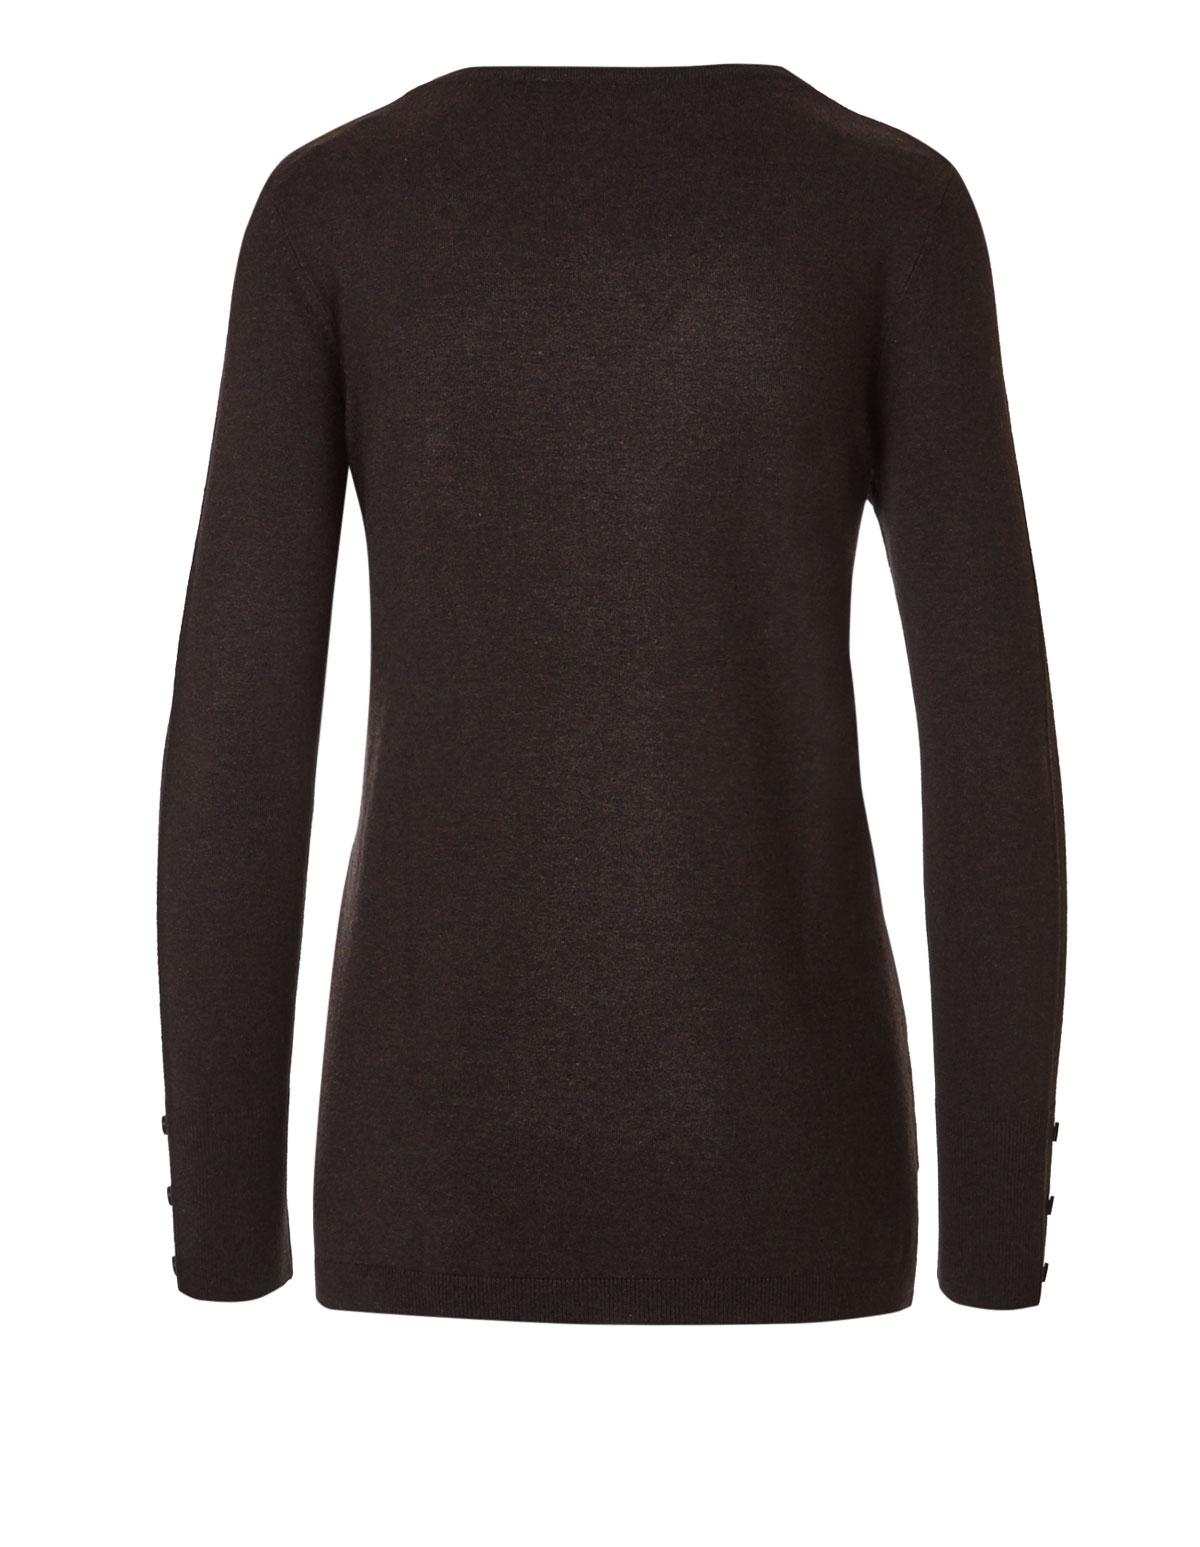 Dark Brown V-Neck Sweater | Cleo